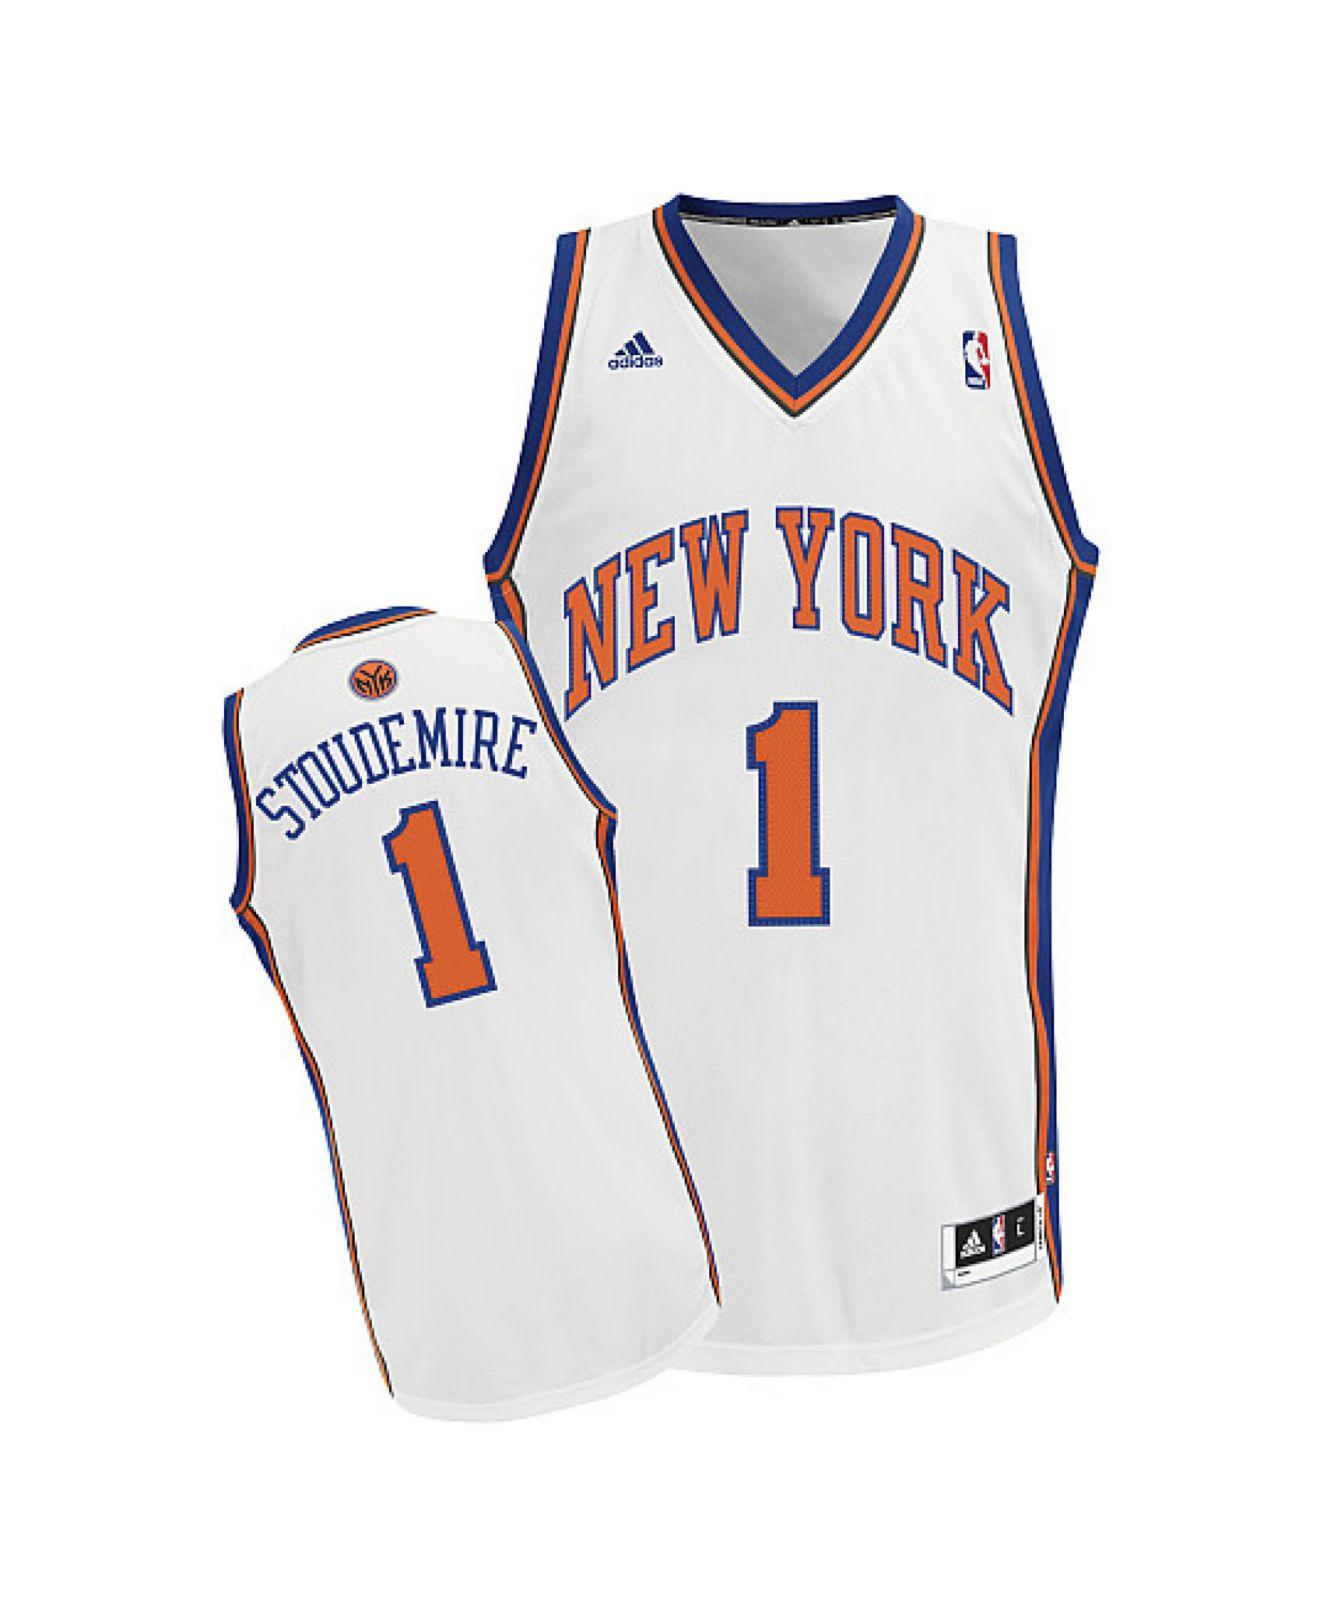 4b26fee8 Lyst - adidas Men's New York Knicks Amar'e Stoudemire Jersey in ...